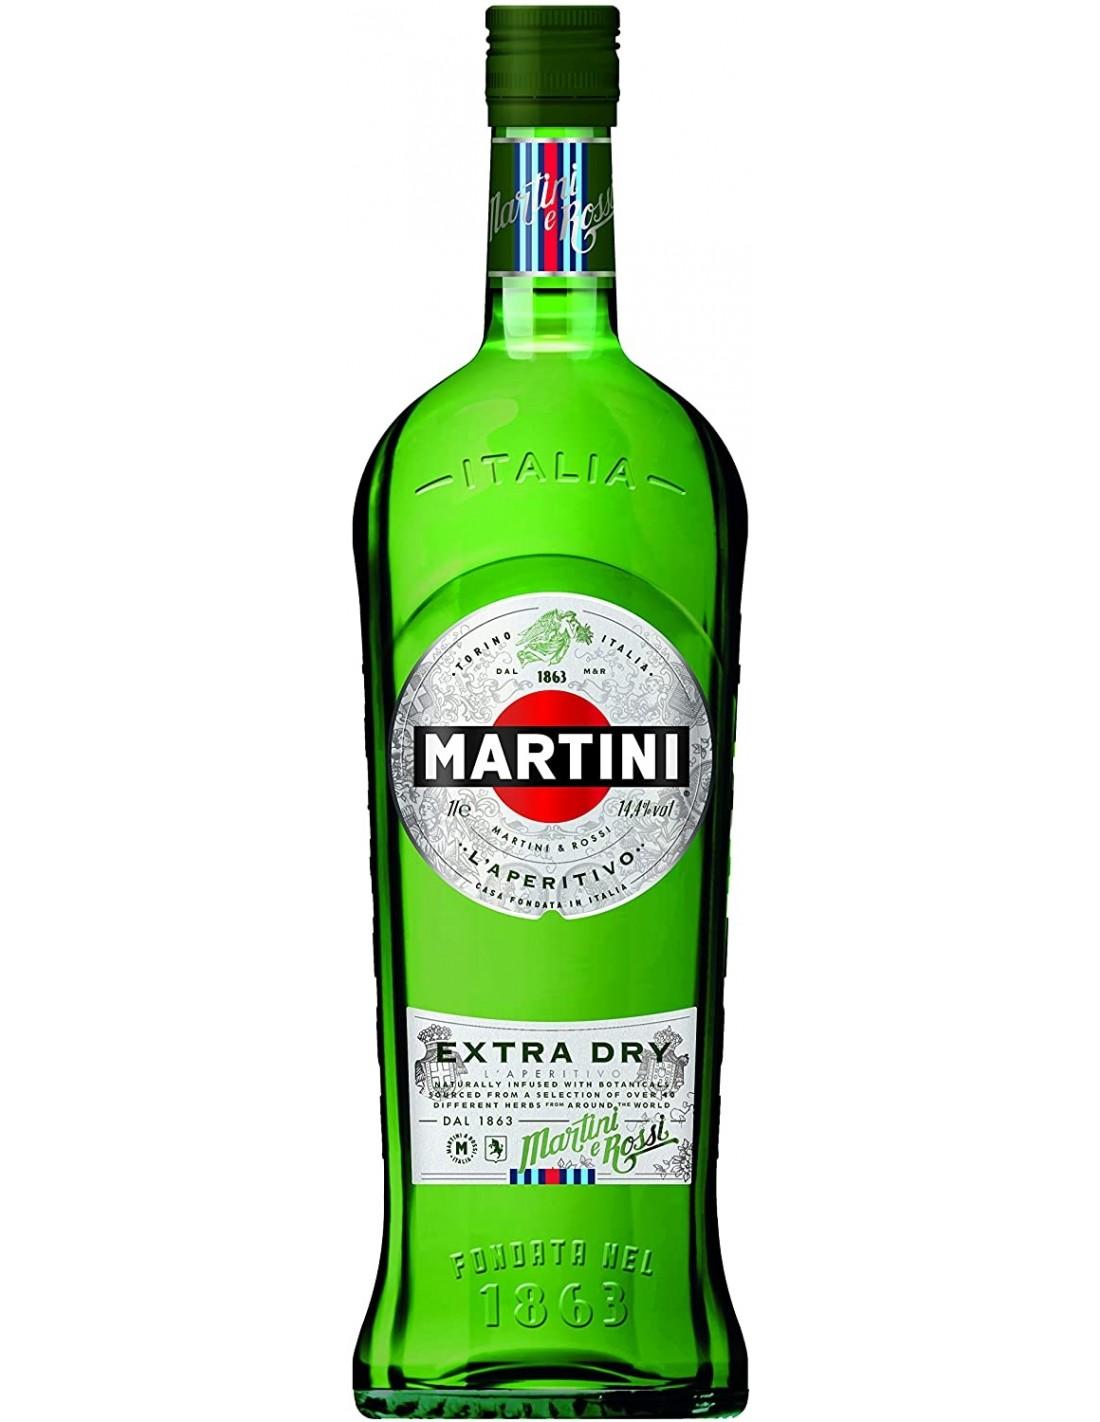 Aperitiv Martini Extra Dry, 18% alc., 1L, Italia